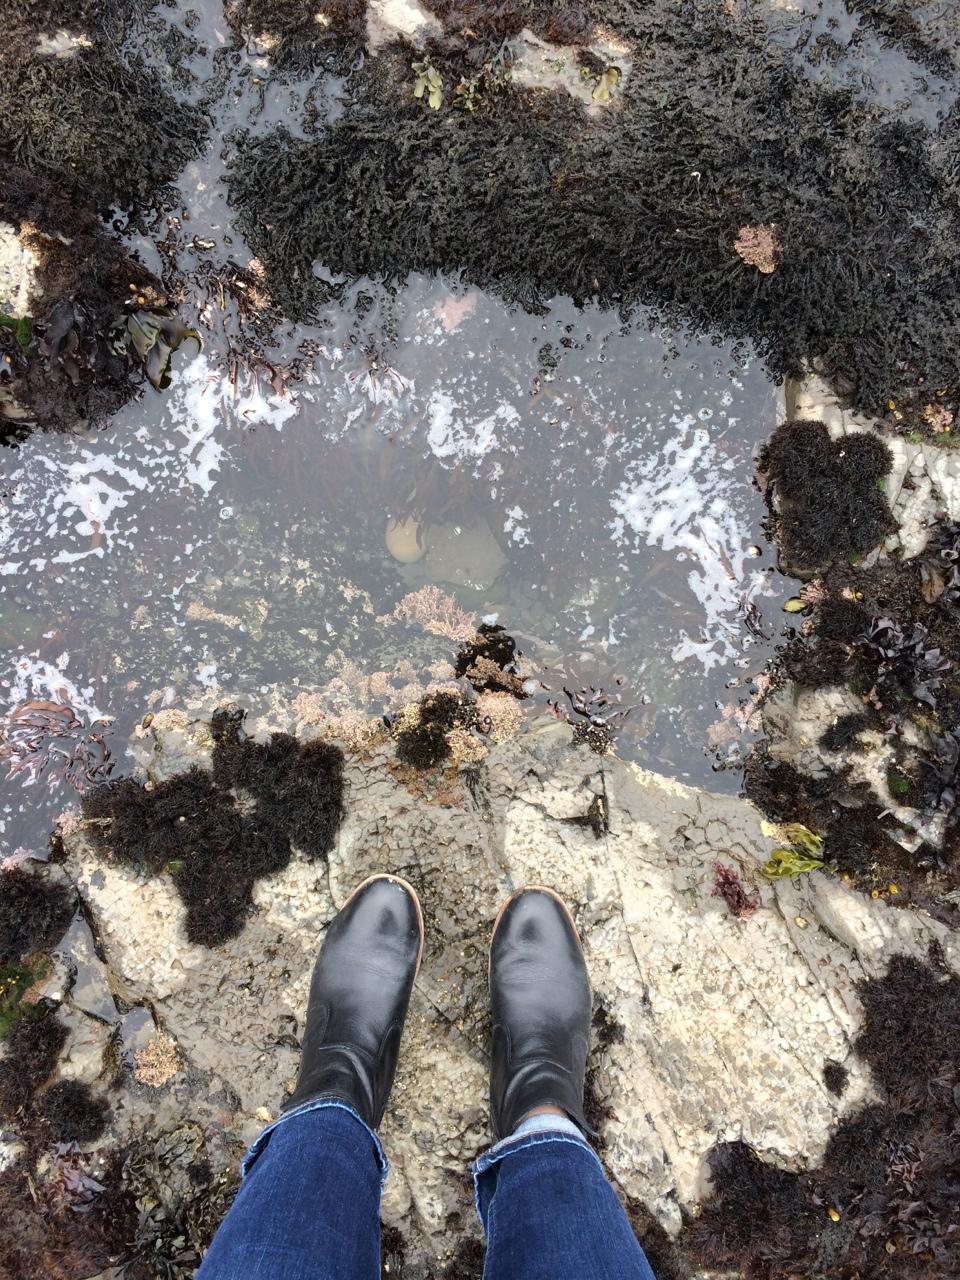 Tidal pools in Moss Beach